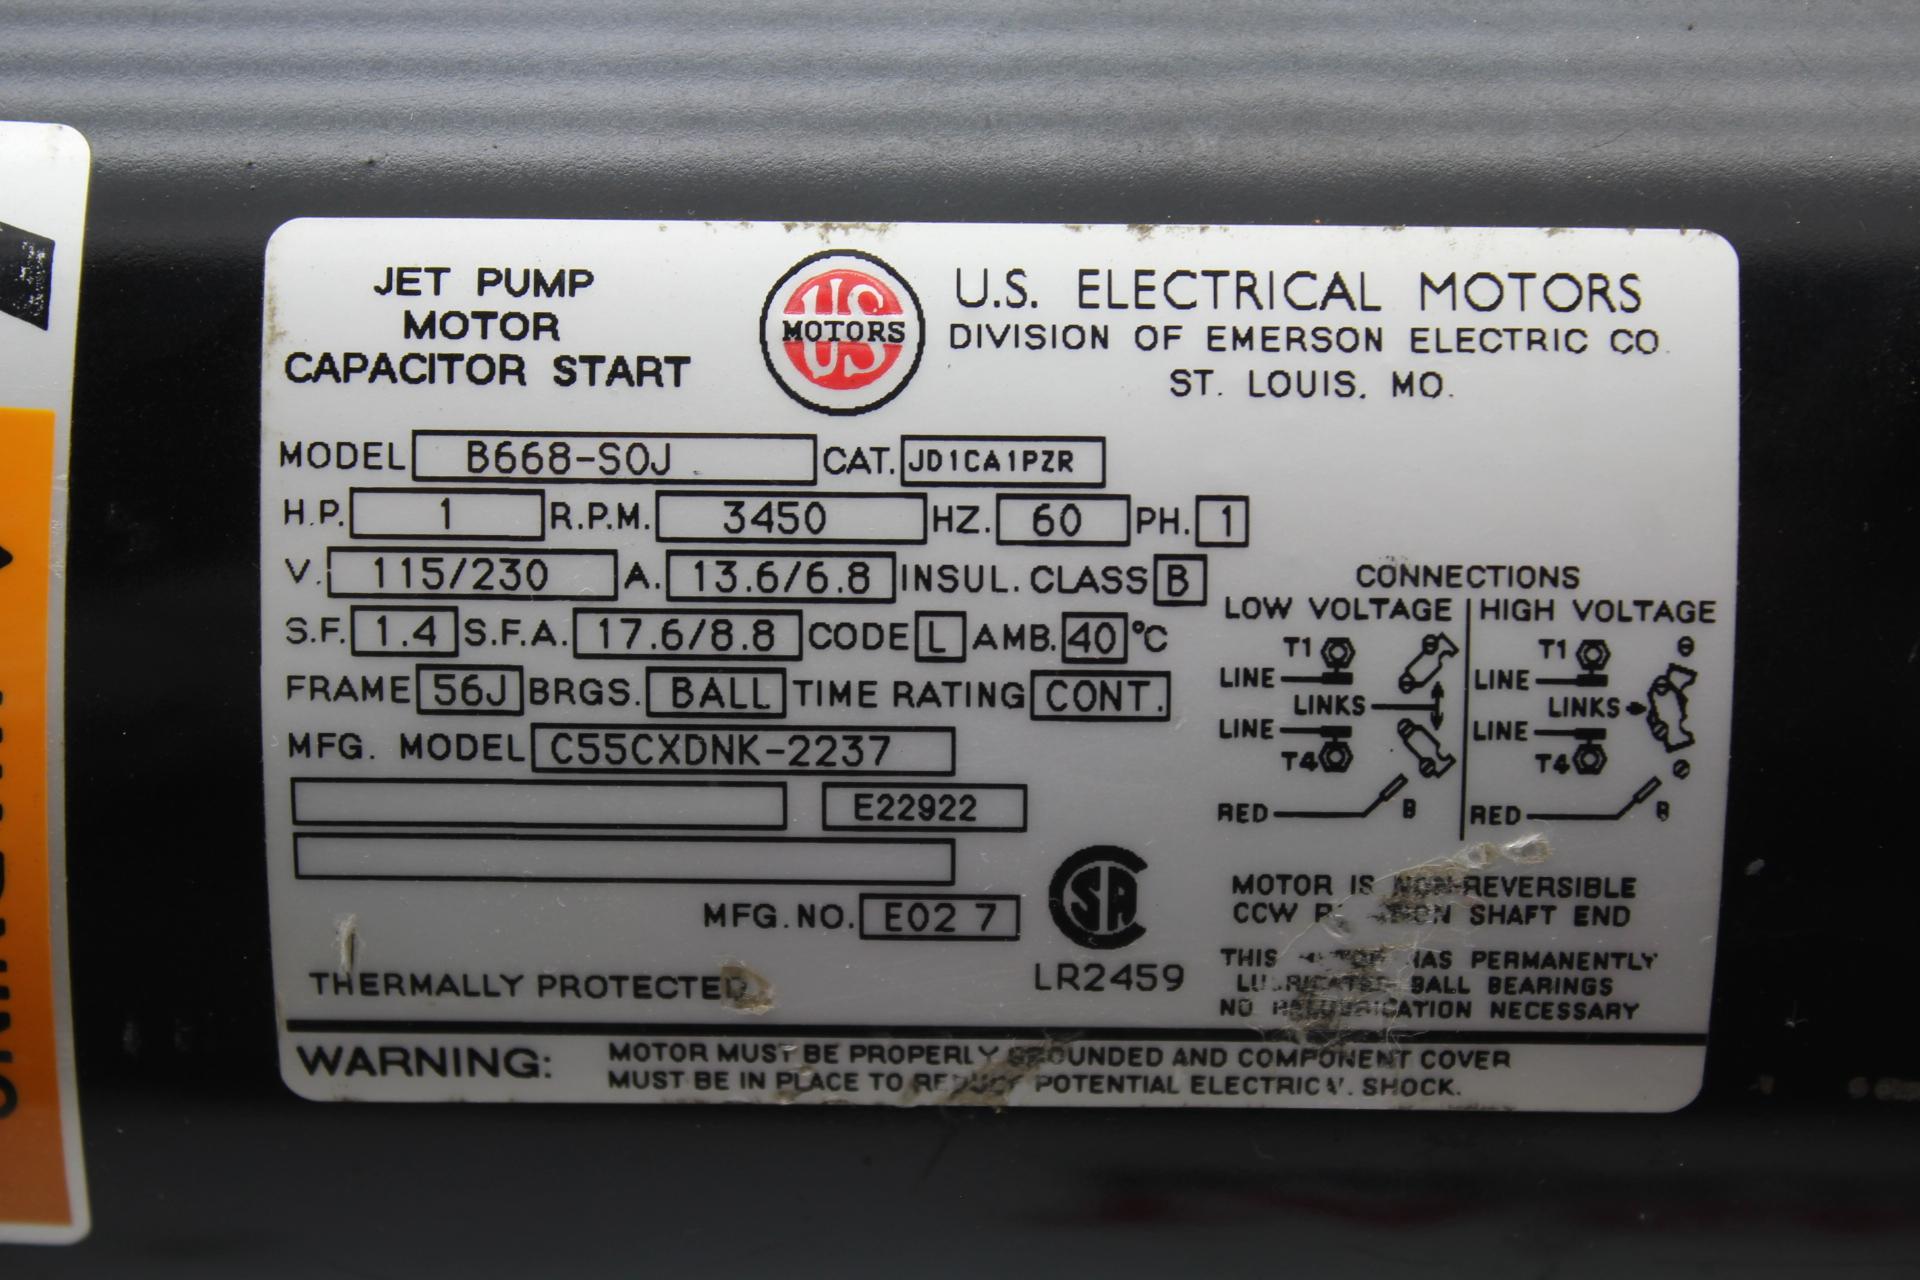 Us motors jet pump model b668 s0j 1 hp 3450 rpm 56j frame 3 ph motor publicscrutiny Image collections